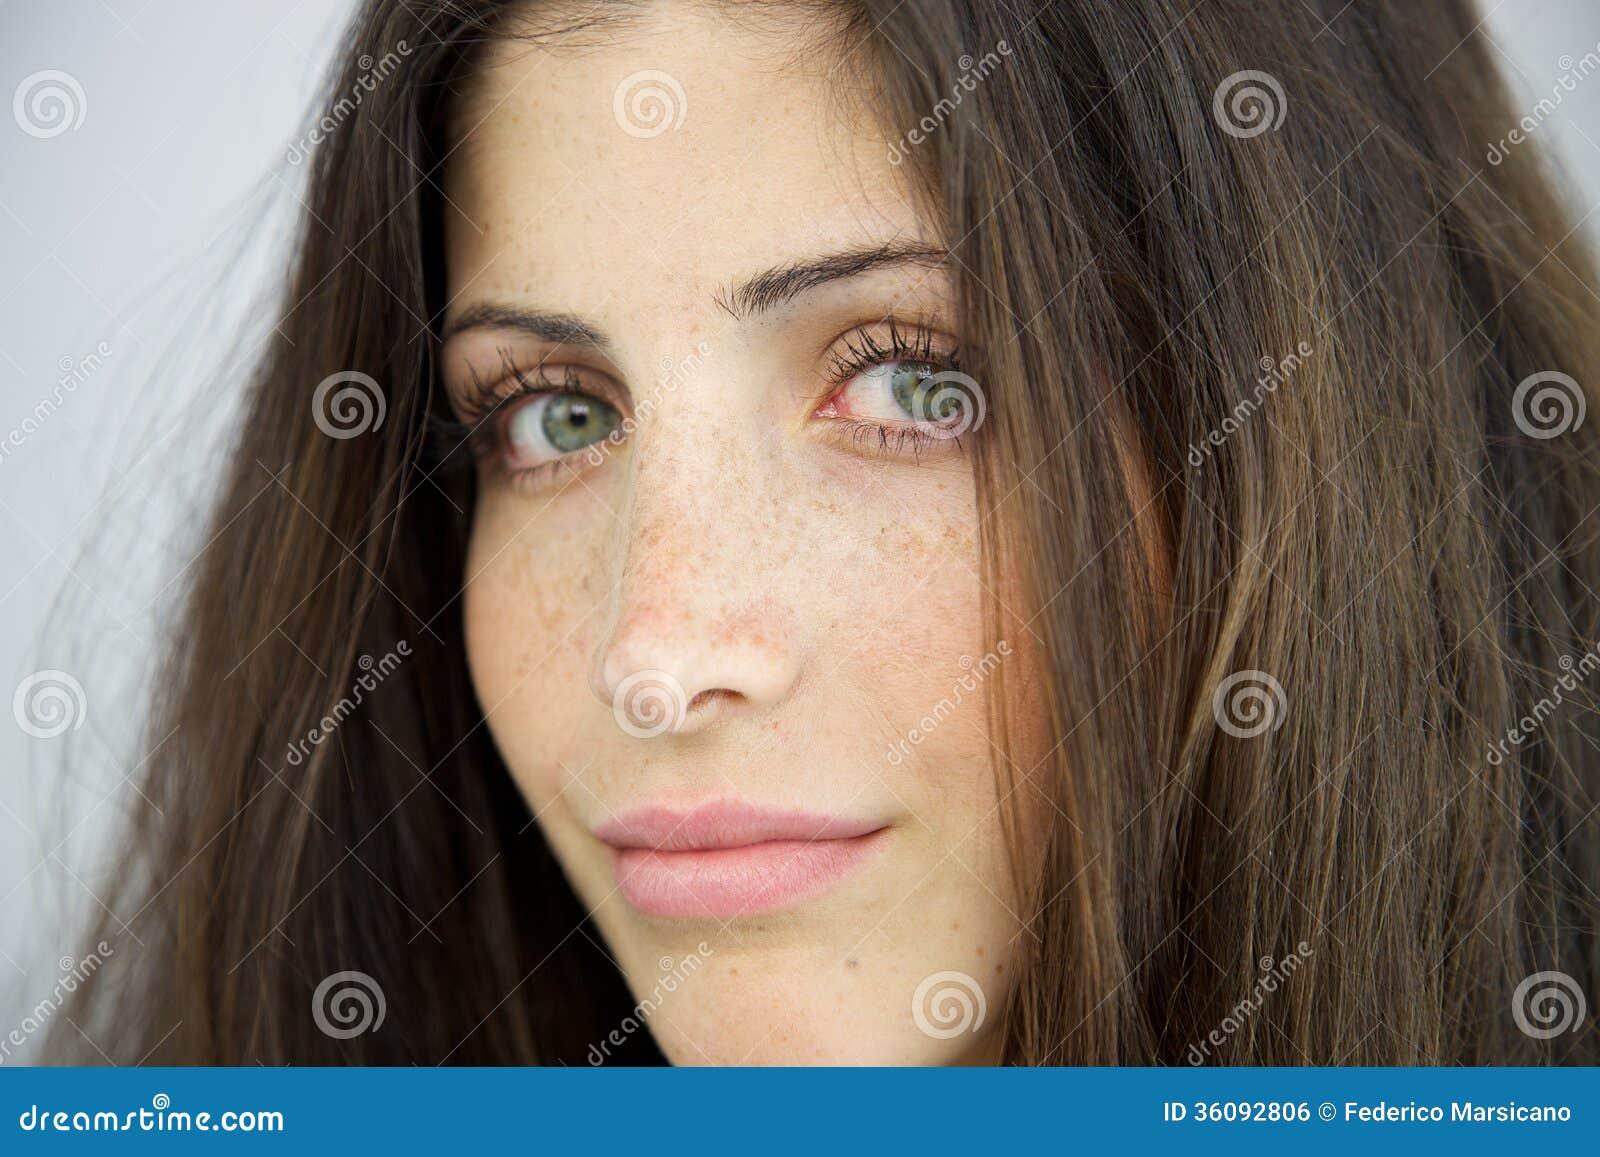 Closeup Of Woman Without Makeup Stock Photo - Image of ...